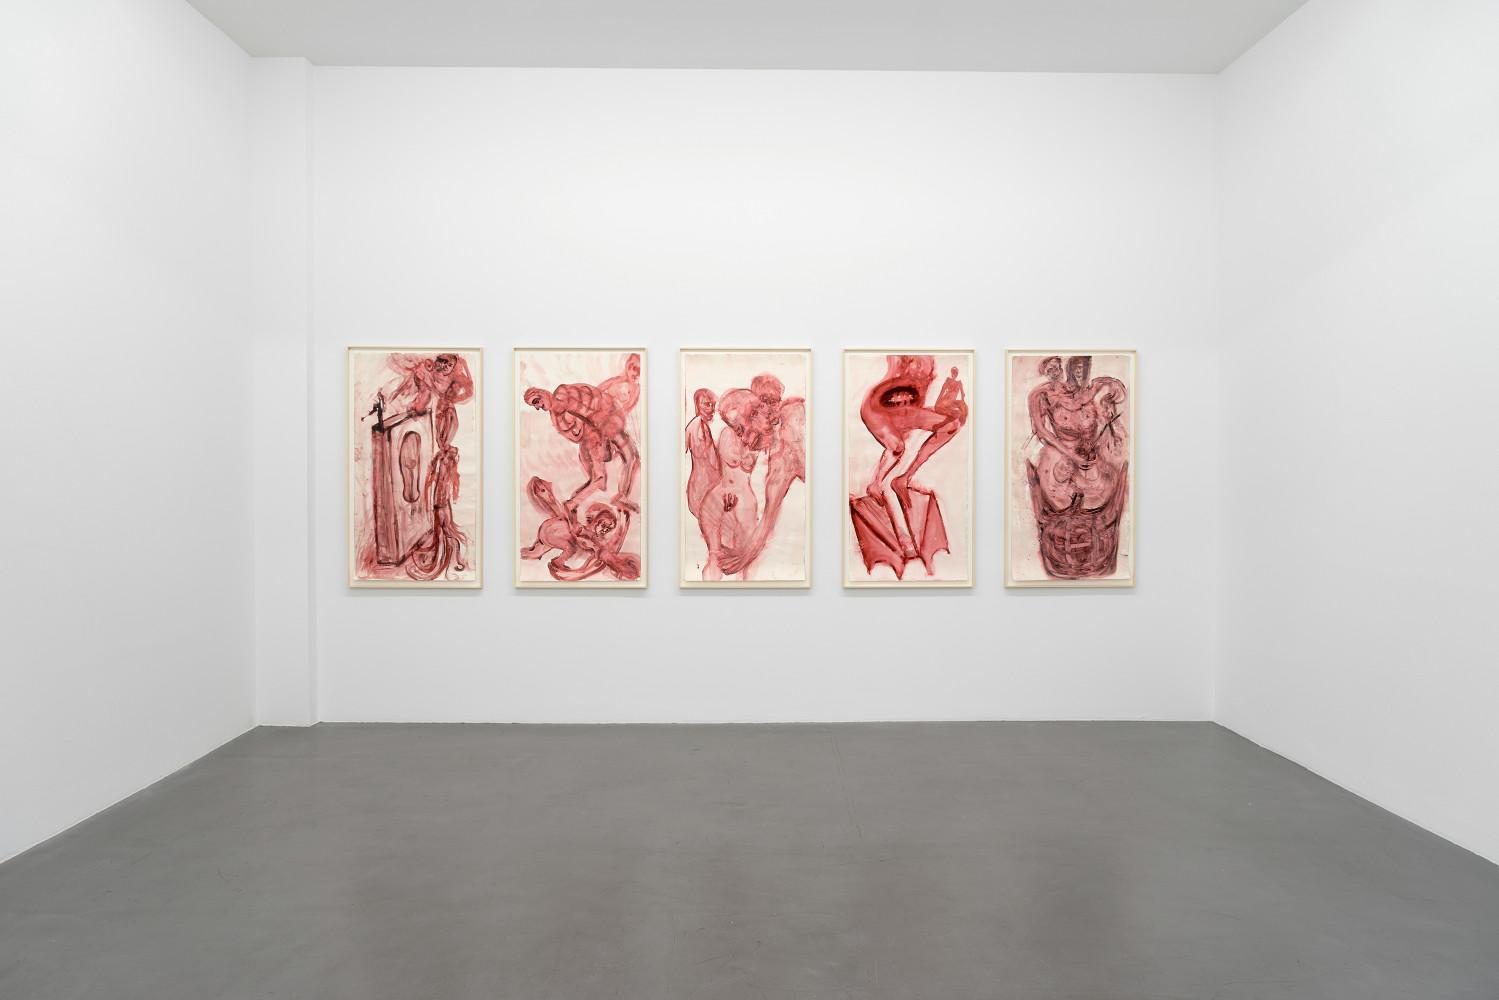 Martin Disler, 'Martin Disler – Malerei', Installation view, Buchmann Galerie, 2017